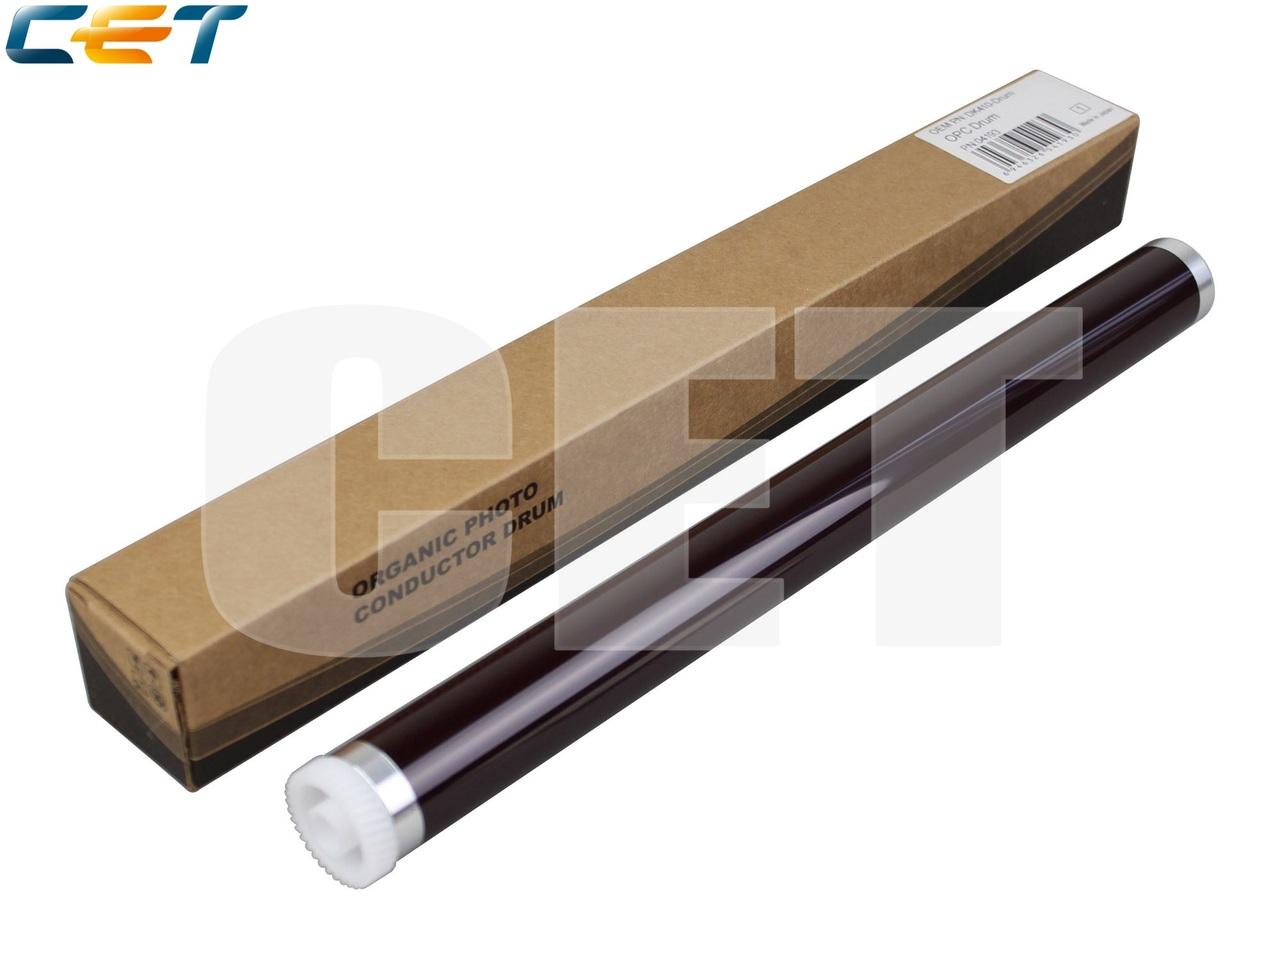 Барабан (10мм втулка) для KYOCERAKM-1620/1650/2020/2050 (CET), 80000 стр., CET4193